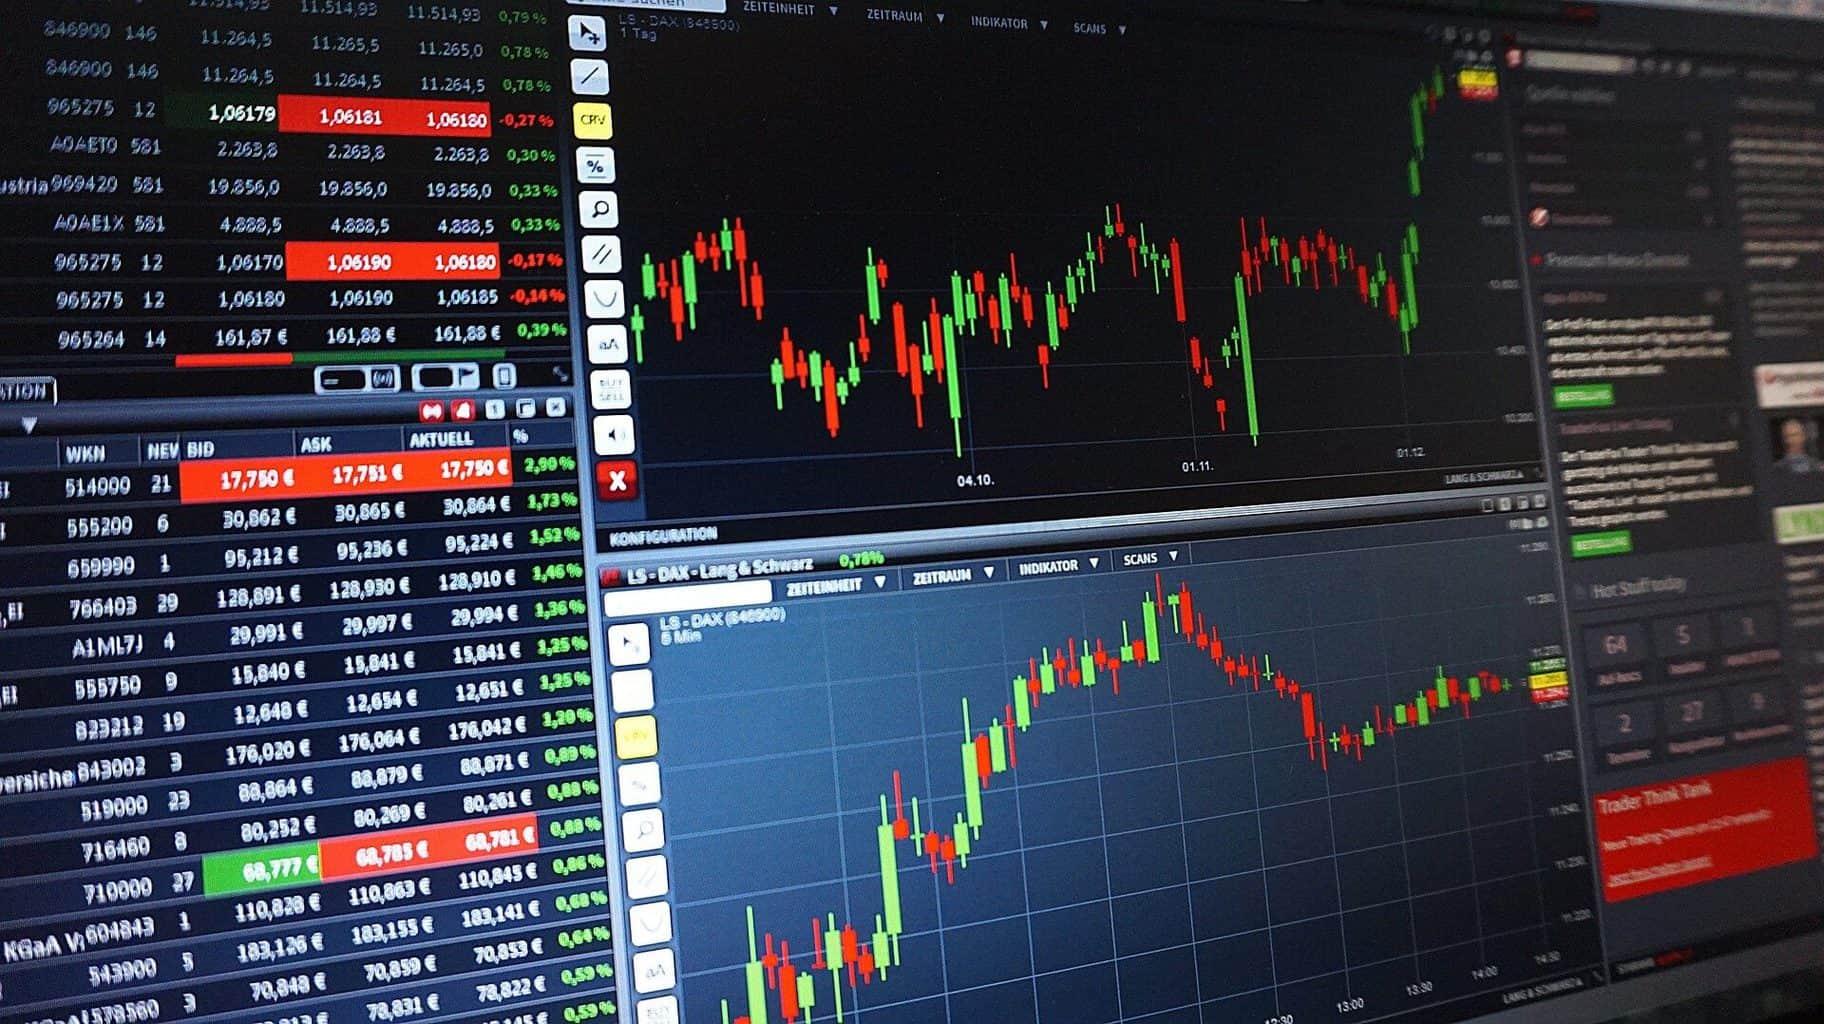 Best ECN Trading Platforms in 2020